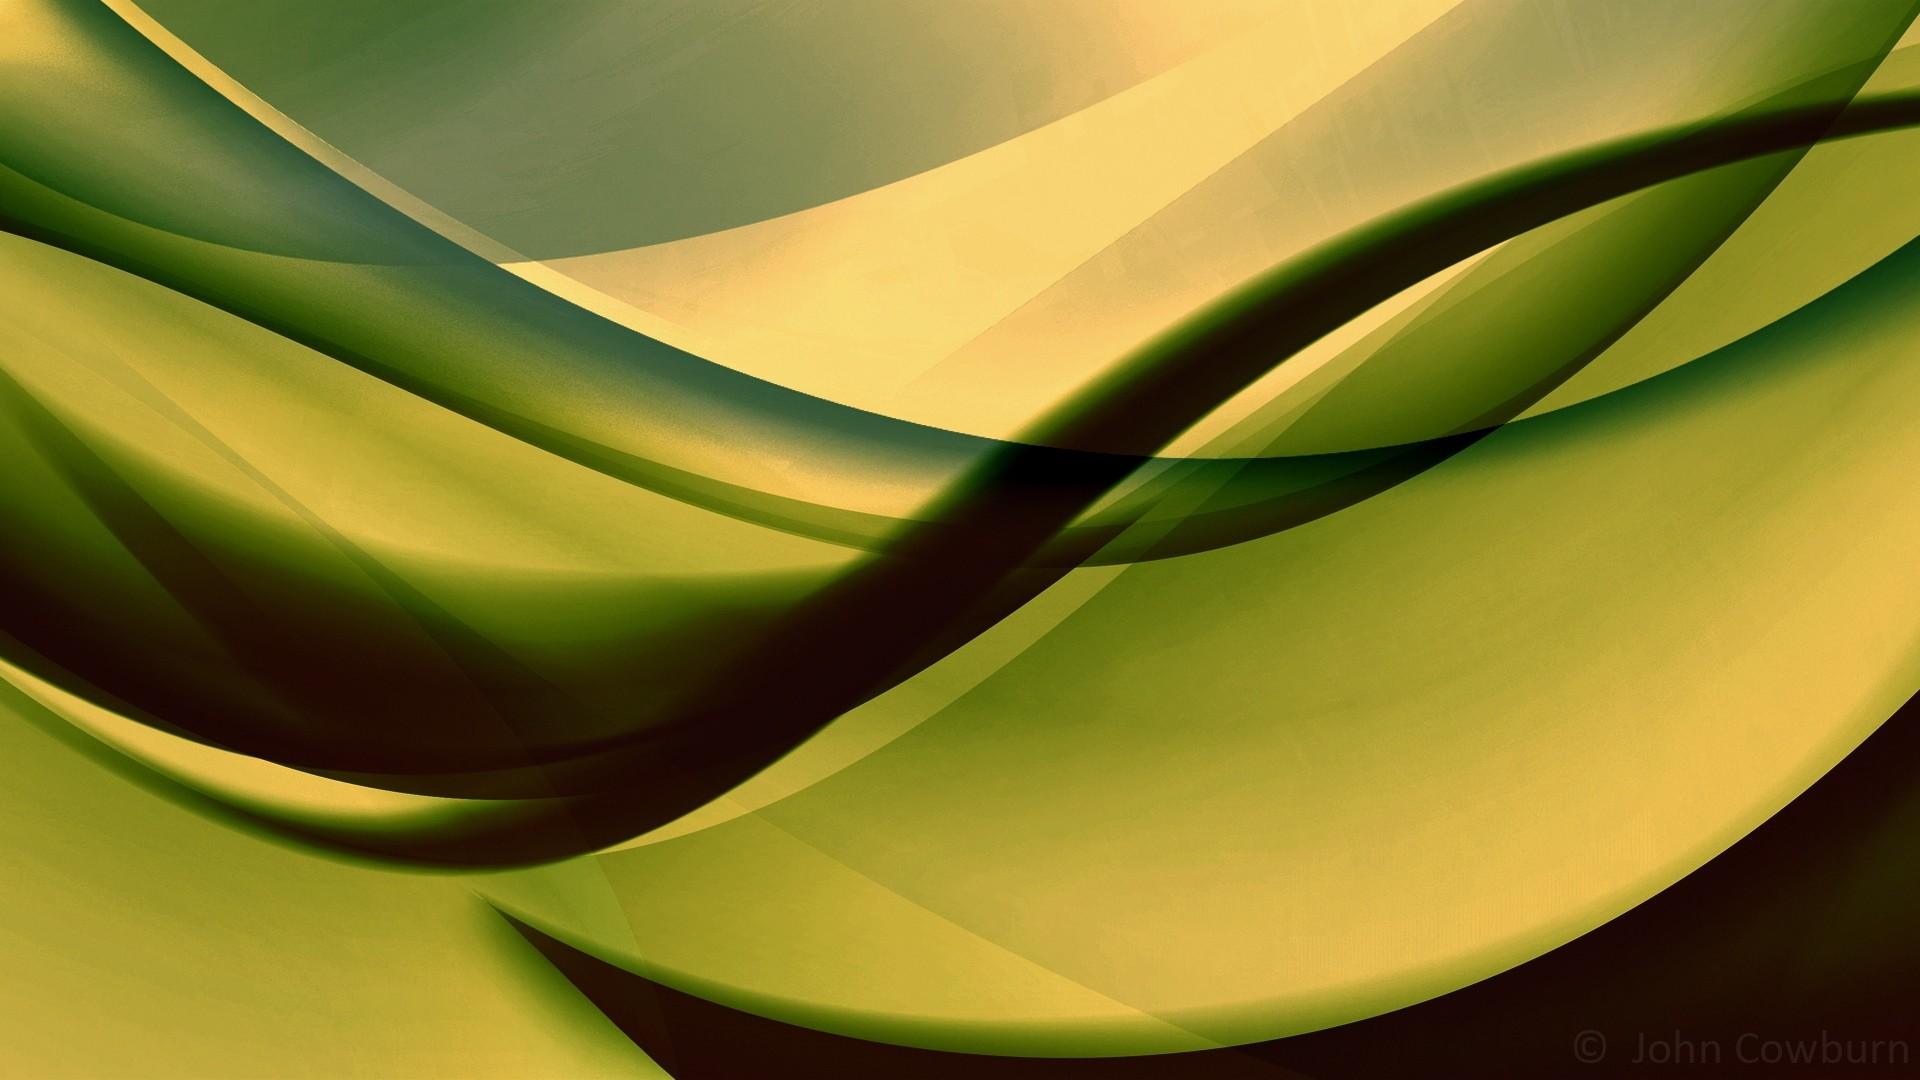 Res: 1920x1080, Olive Green Wallpaper – Wallpapersafari intended for Olive Green Wallpaper